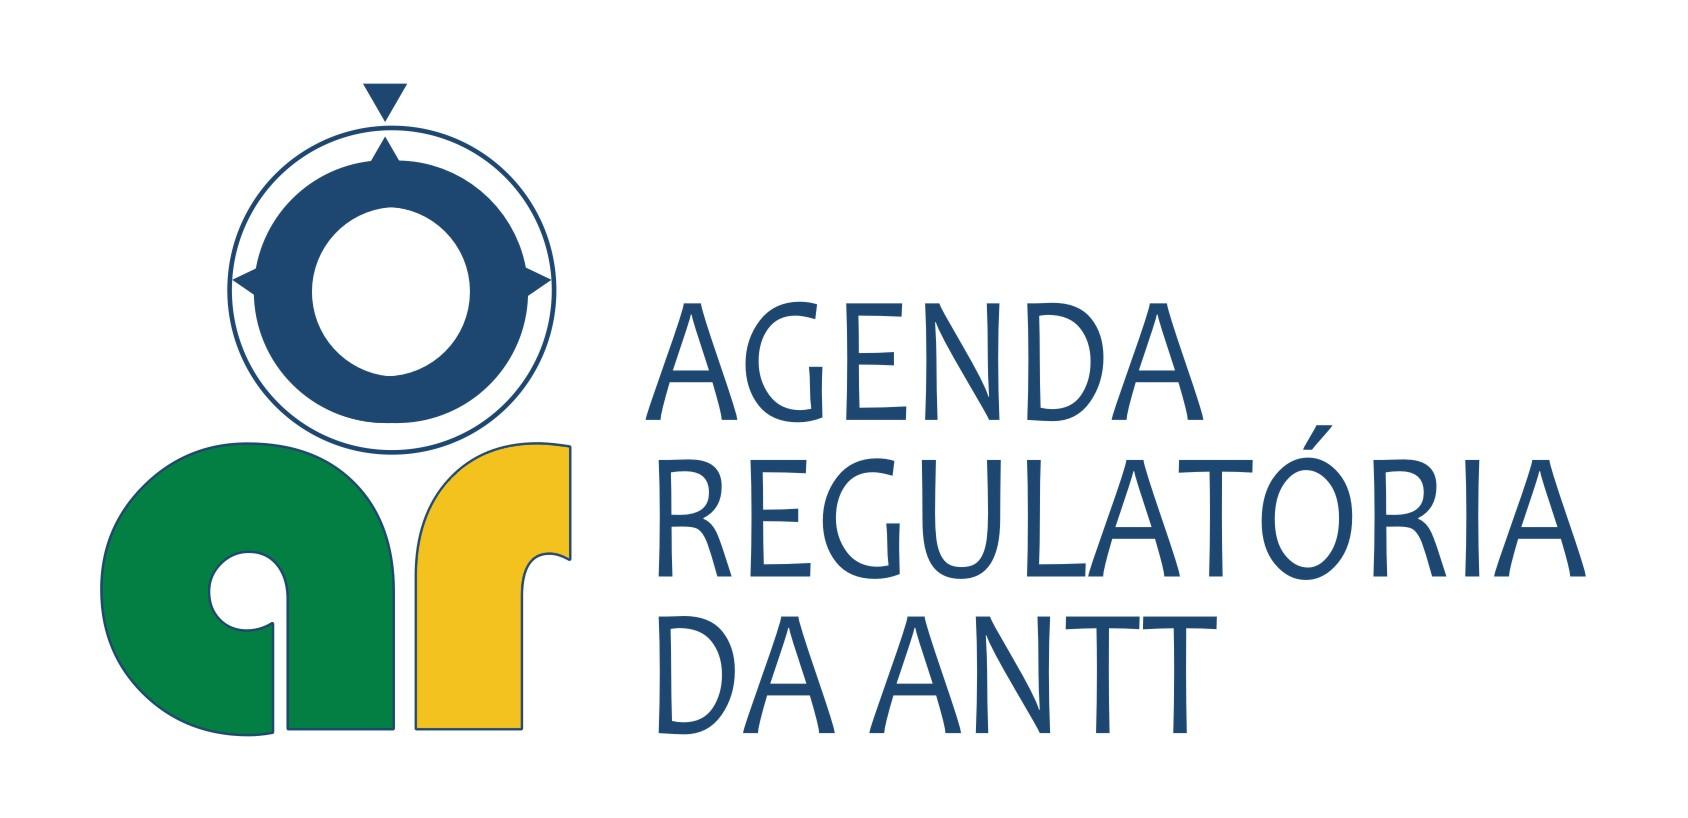 http://governanca.antt.gov.br/PublishingImages/Lists/Noticia/Logo_Oficial_Agenda_Regulatoria.jpg